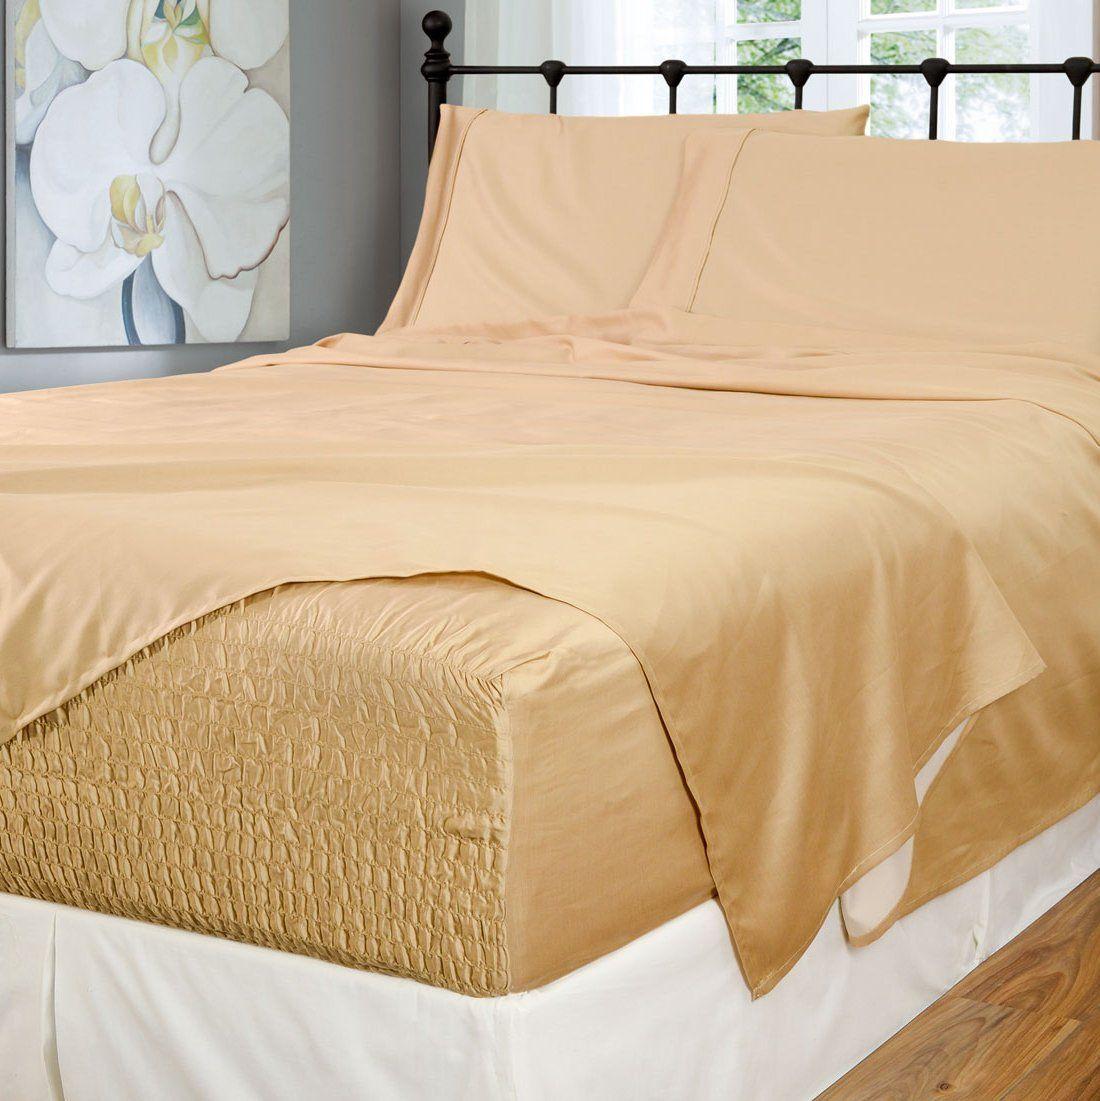 Bed tite stretch fit 500thread count cotton rich super